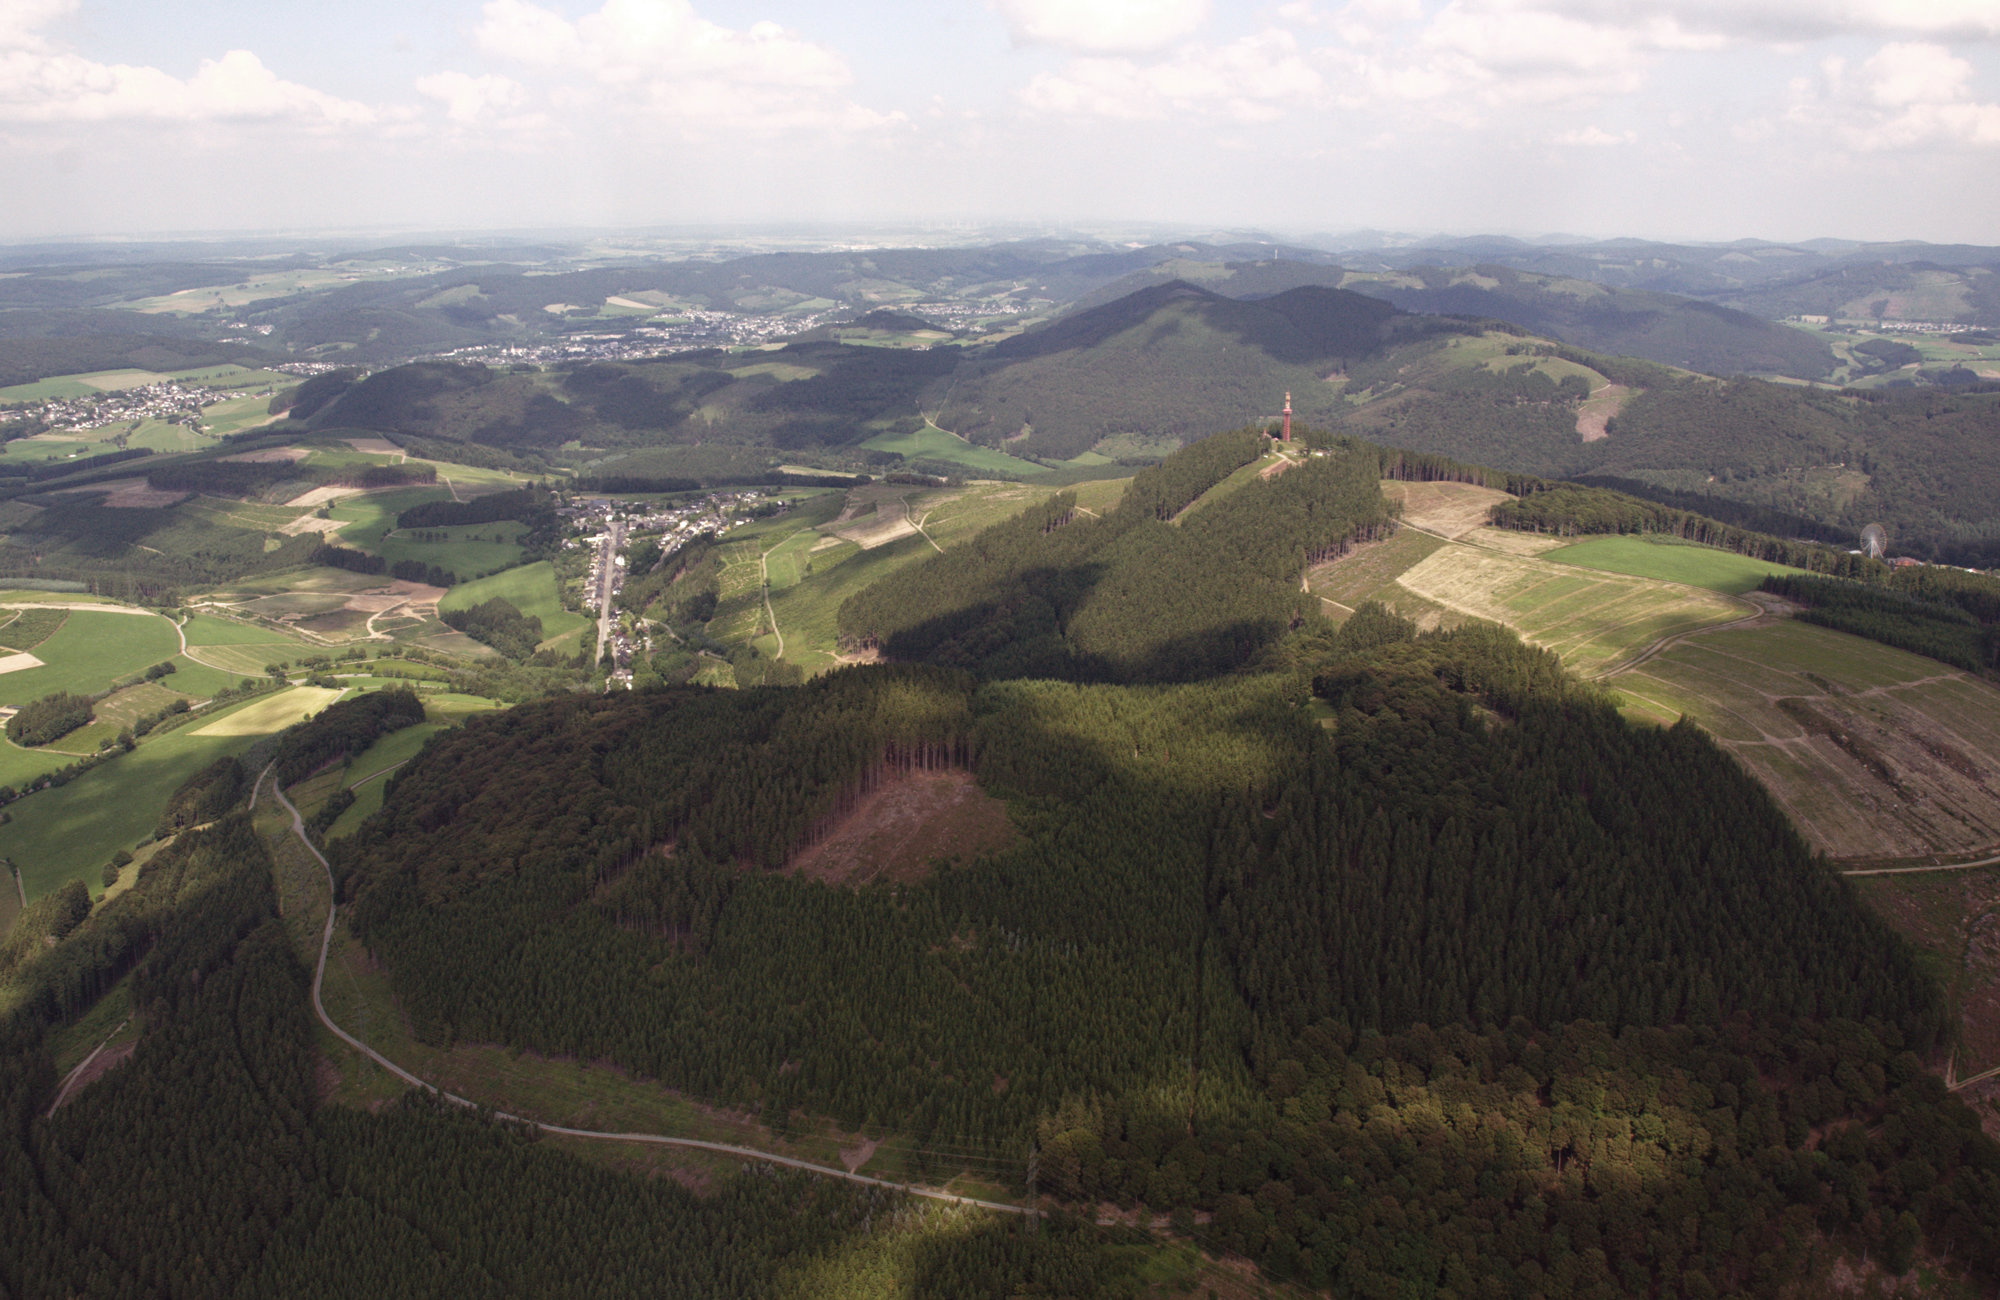 Wandern in Nordrhein-Westfalen Rothaargebirge